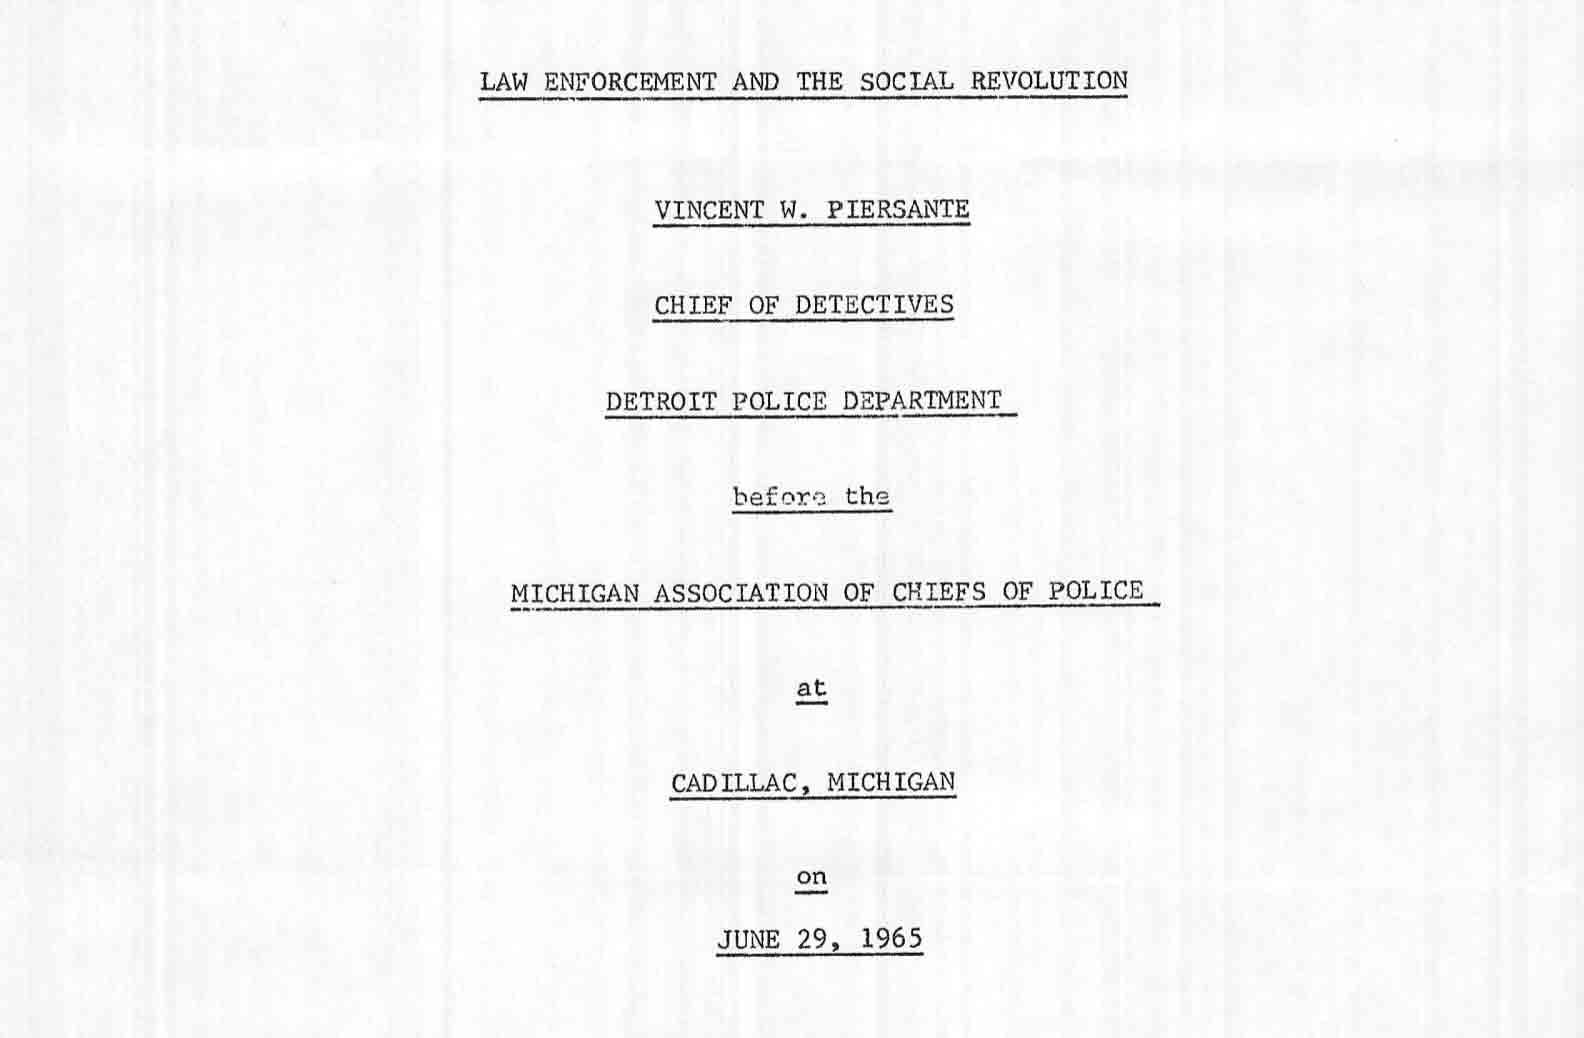 Law Enforcement and Social Revolution